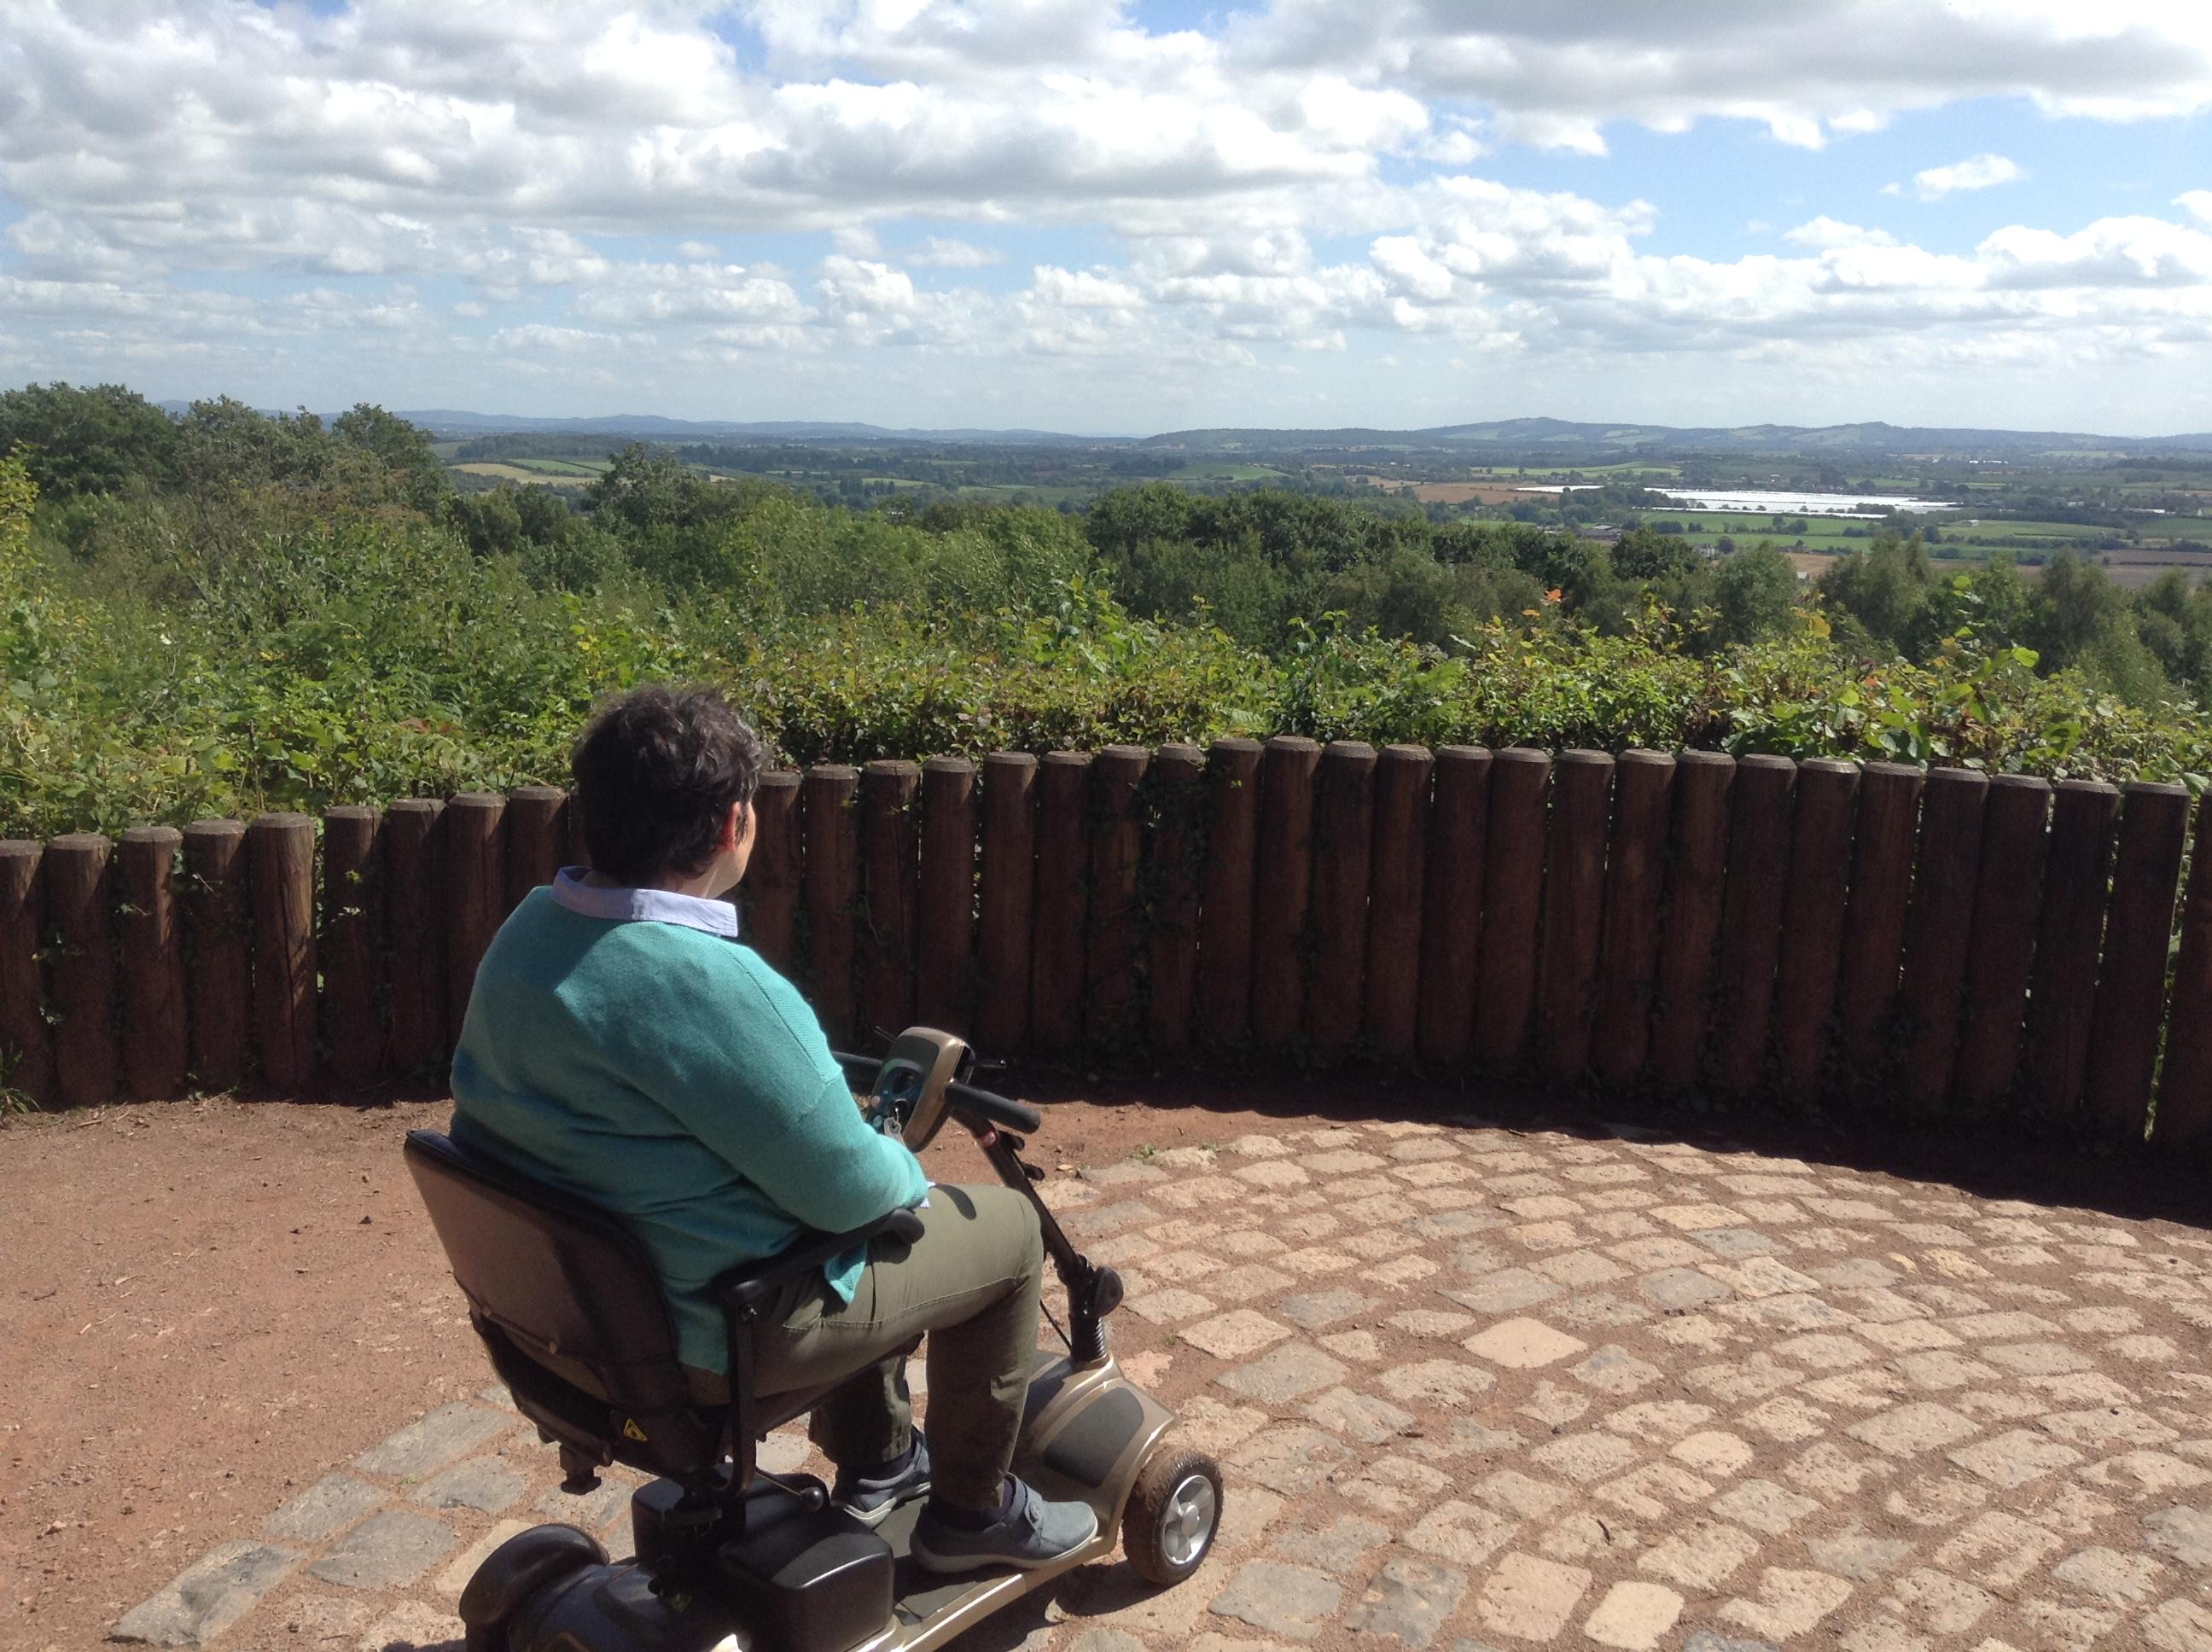 Amazing view at Queenswood Arboretum, Herefordhsire